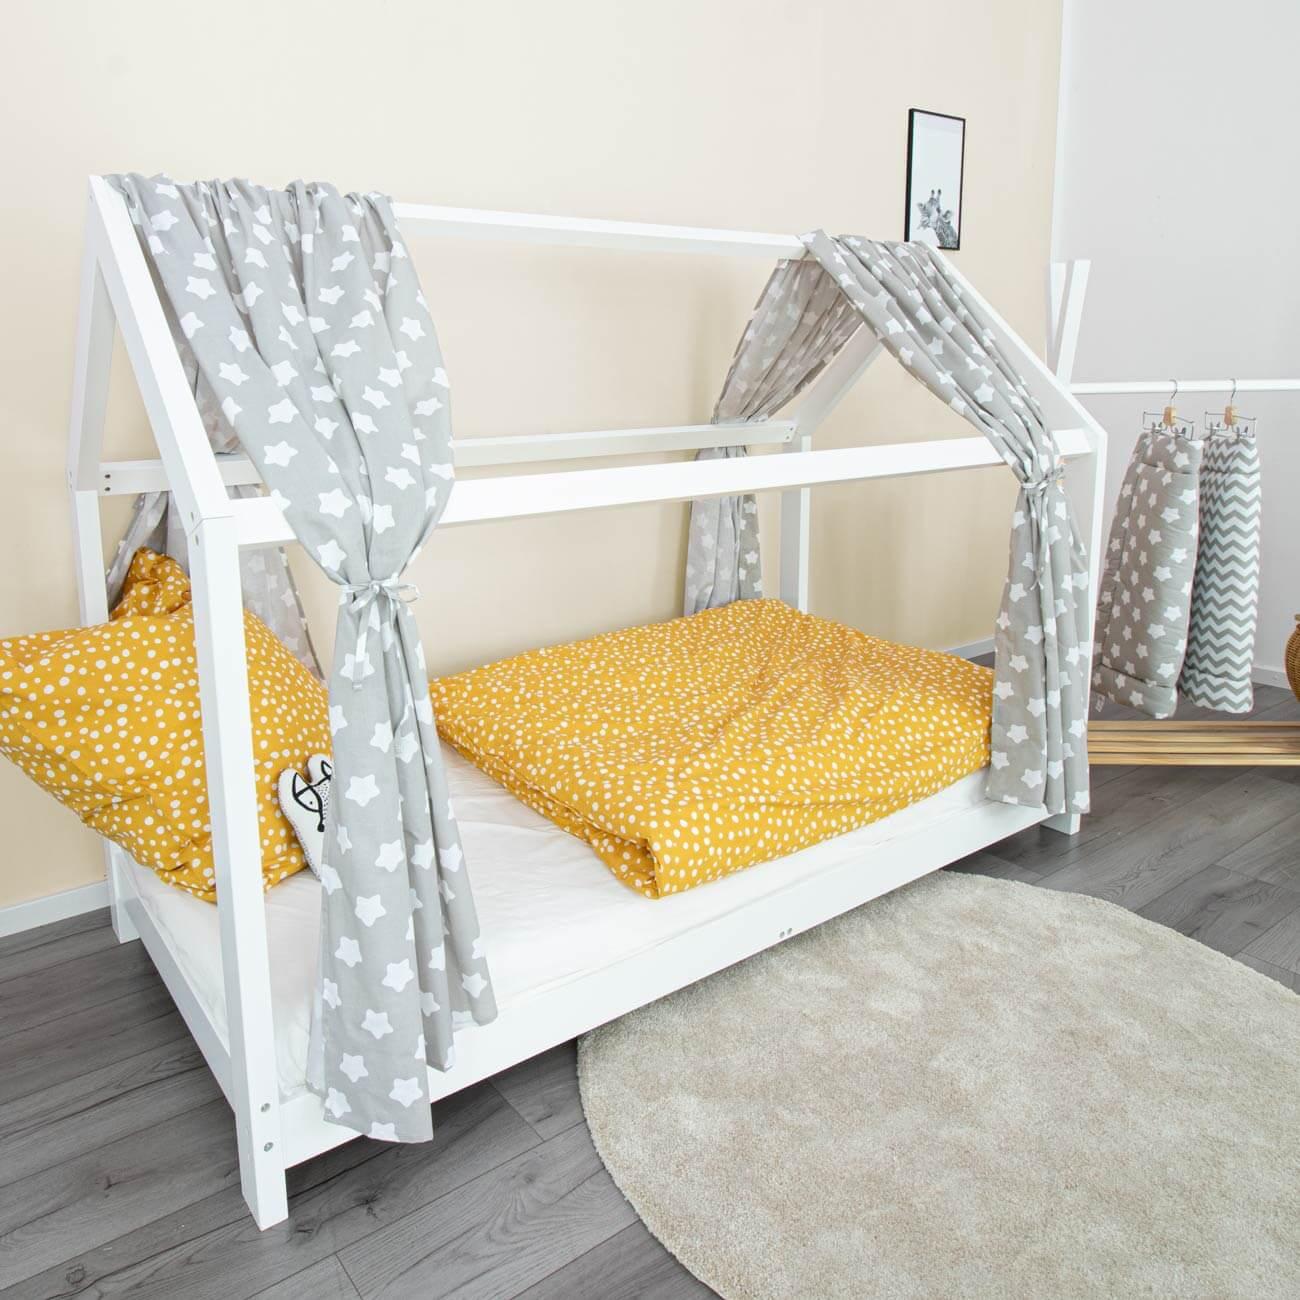 House bed curtain Finja, stars grey, 146 x 298 cm